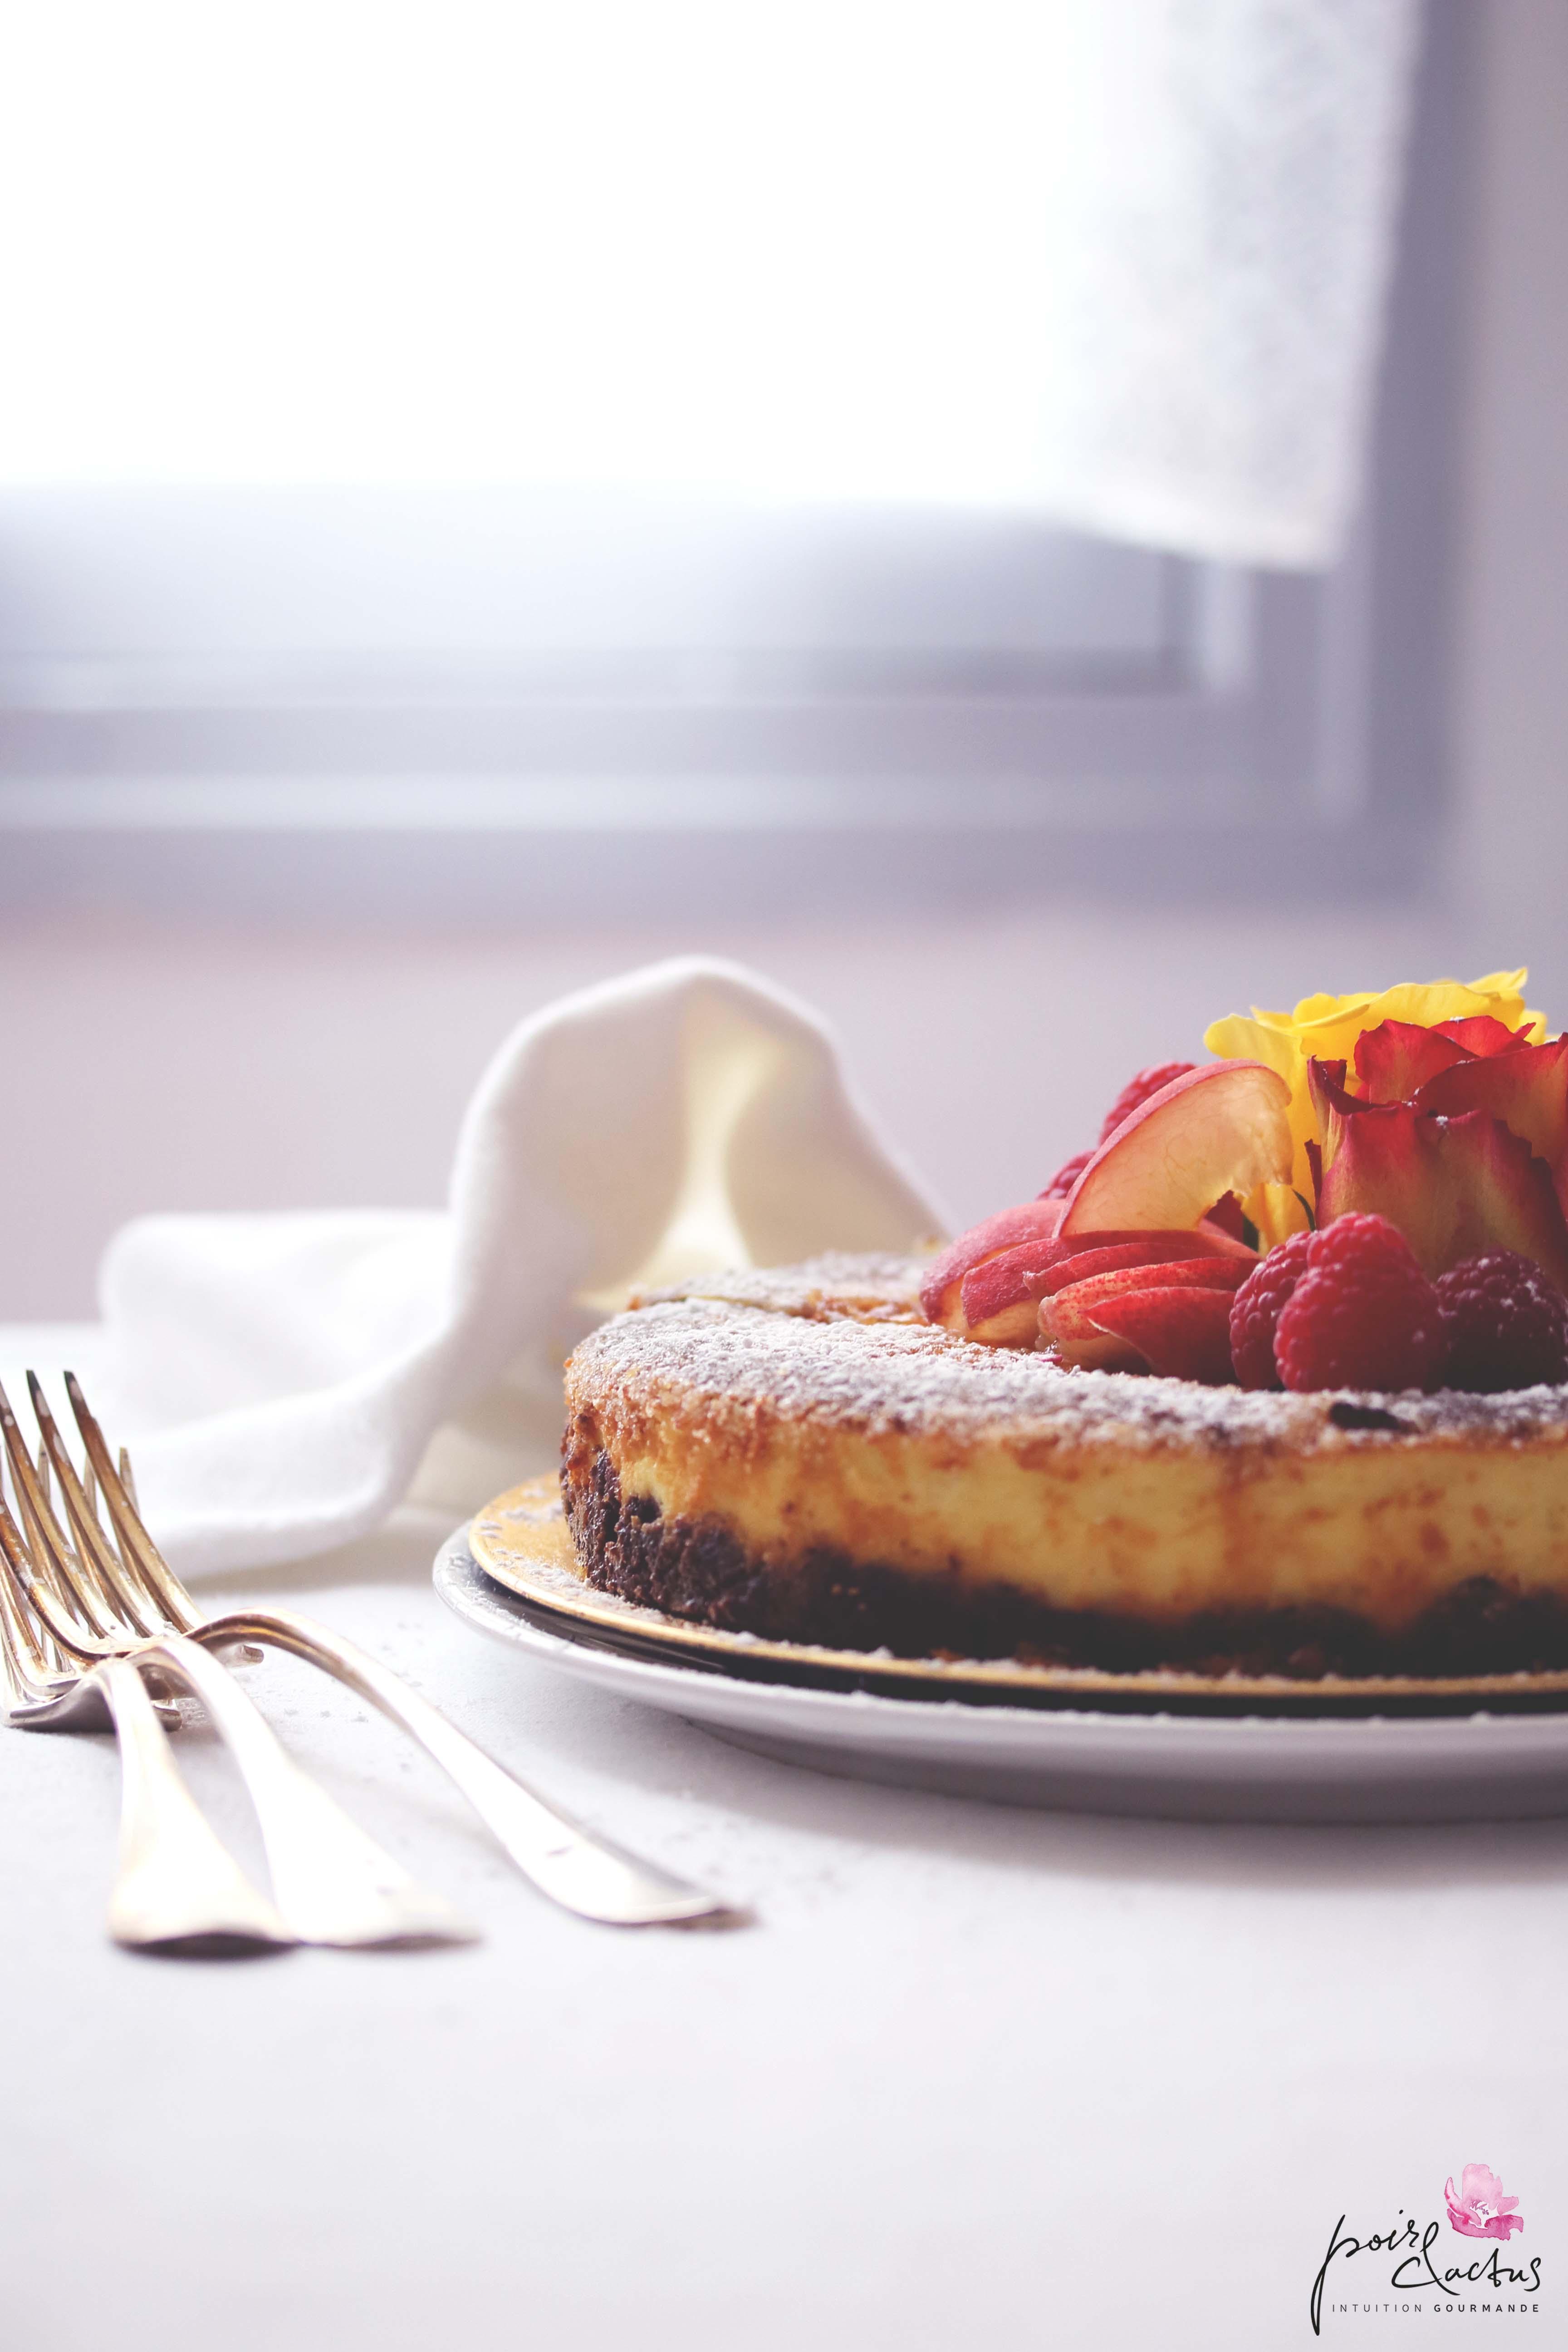 recette_cheese_Cake_creme_brulee_poiretccatus1